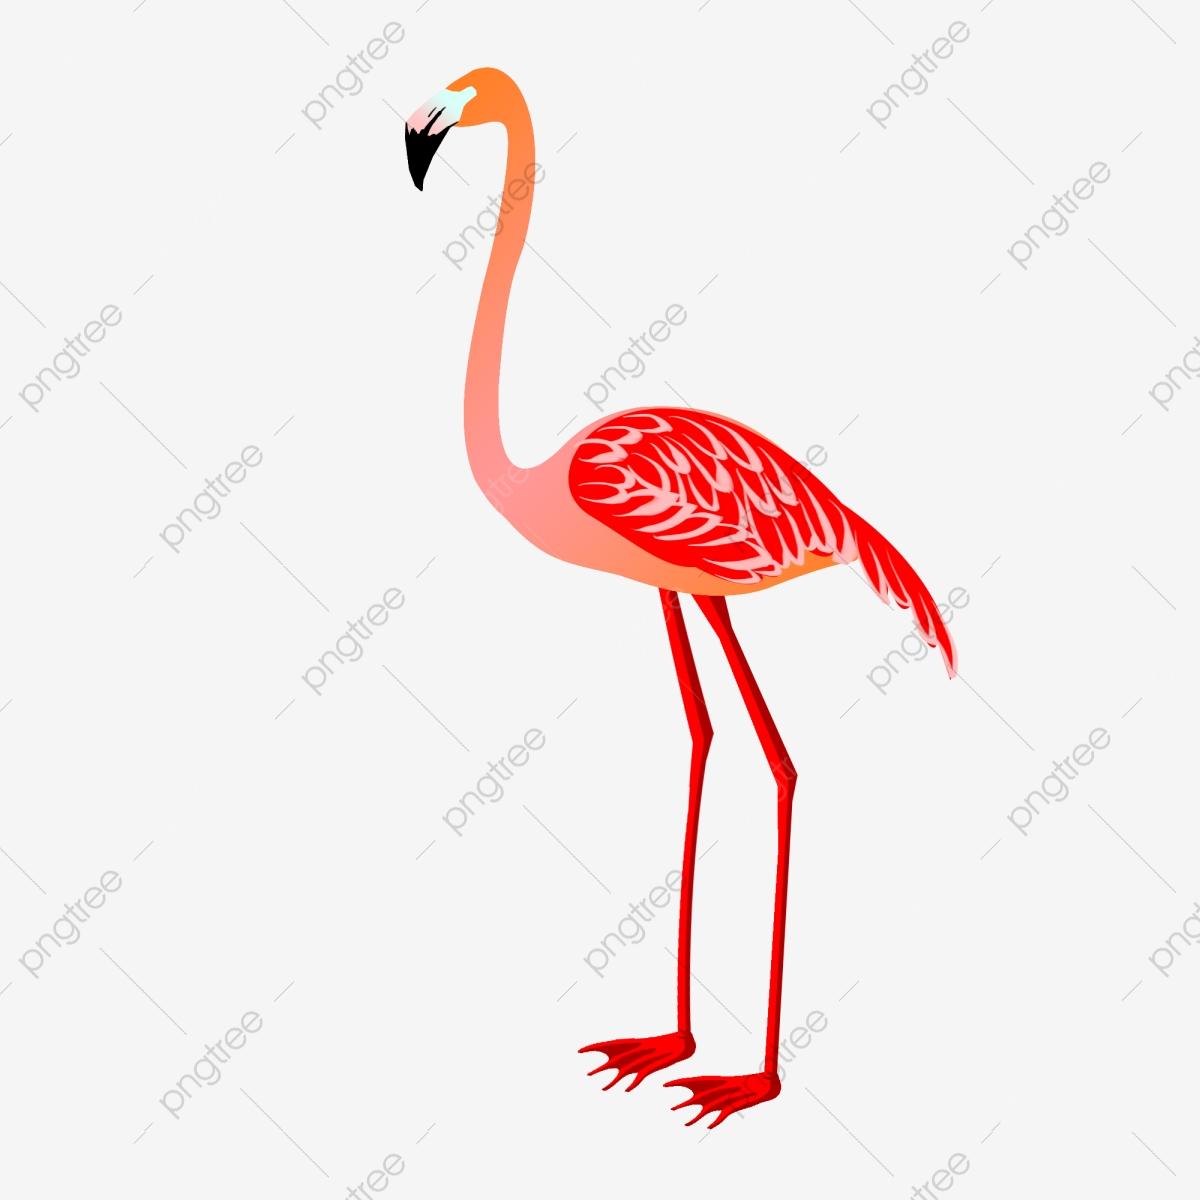 Flamingo clipart female, Flamingo female Transparent FREE.